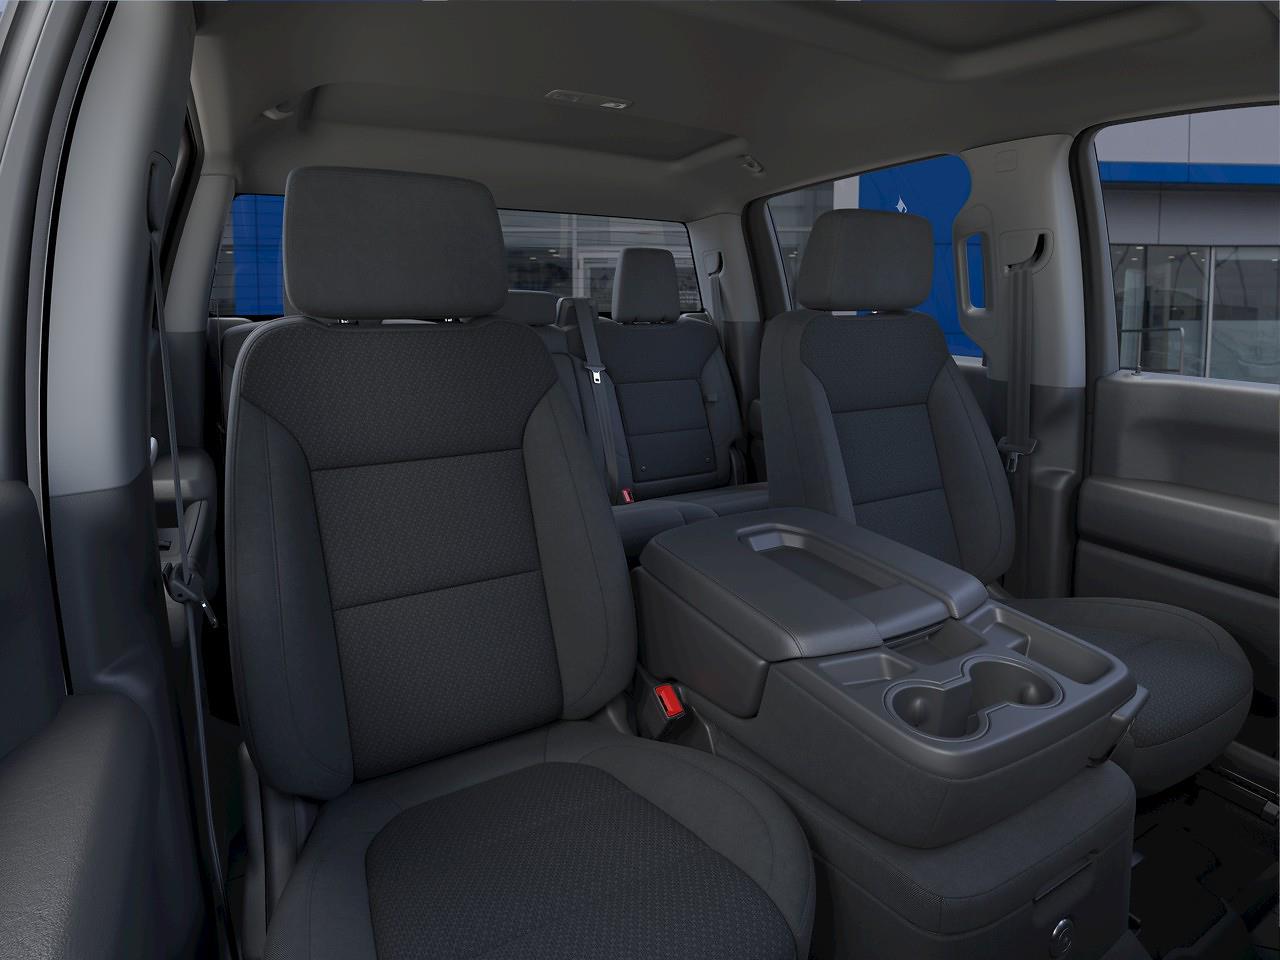 2021 Chevrolet Silverado 1500 Crew Cab 4x4, Pickup #M1314 - photo 13